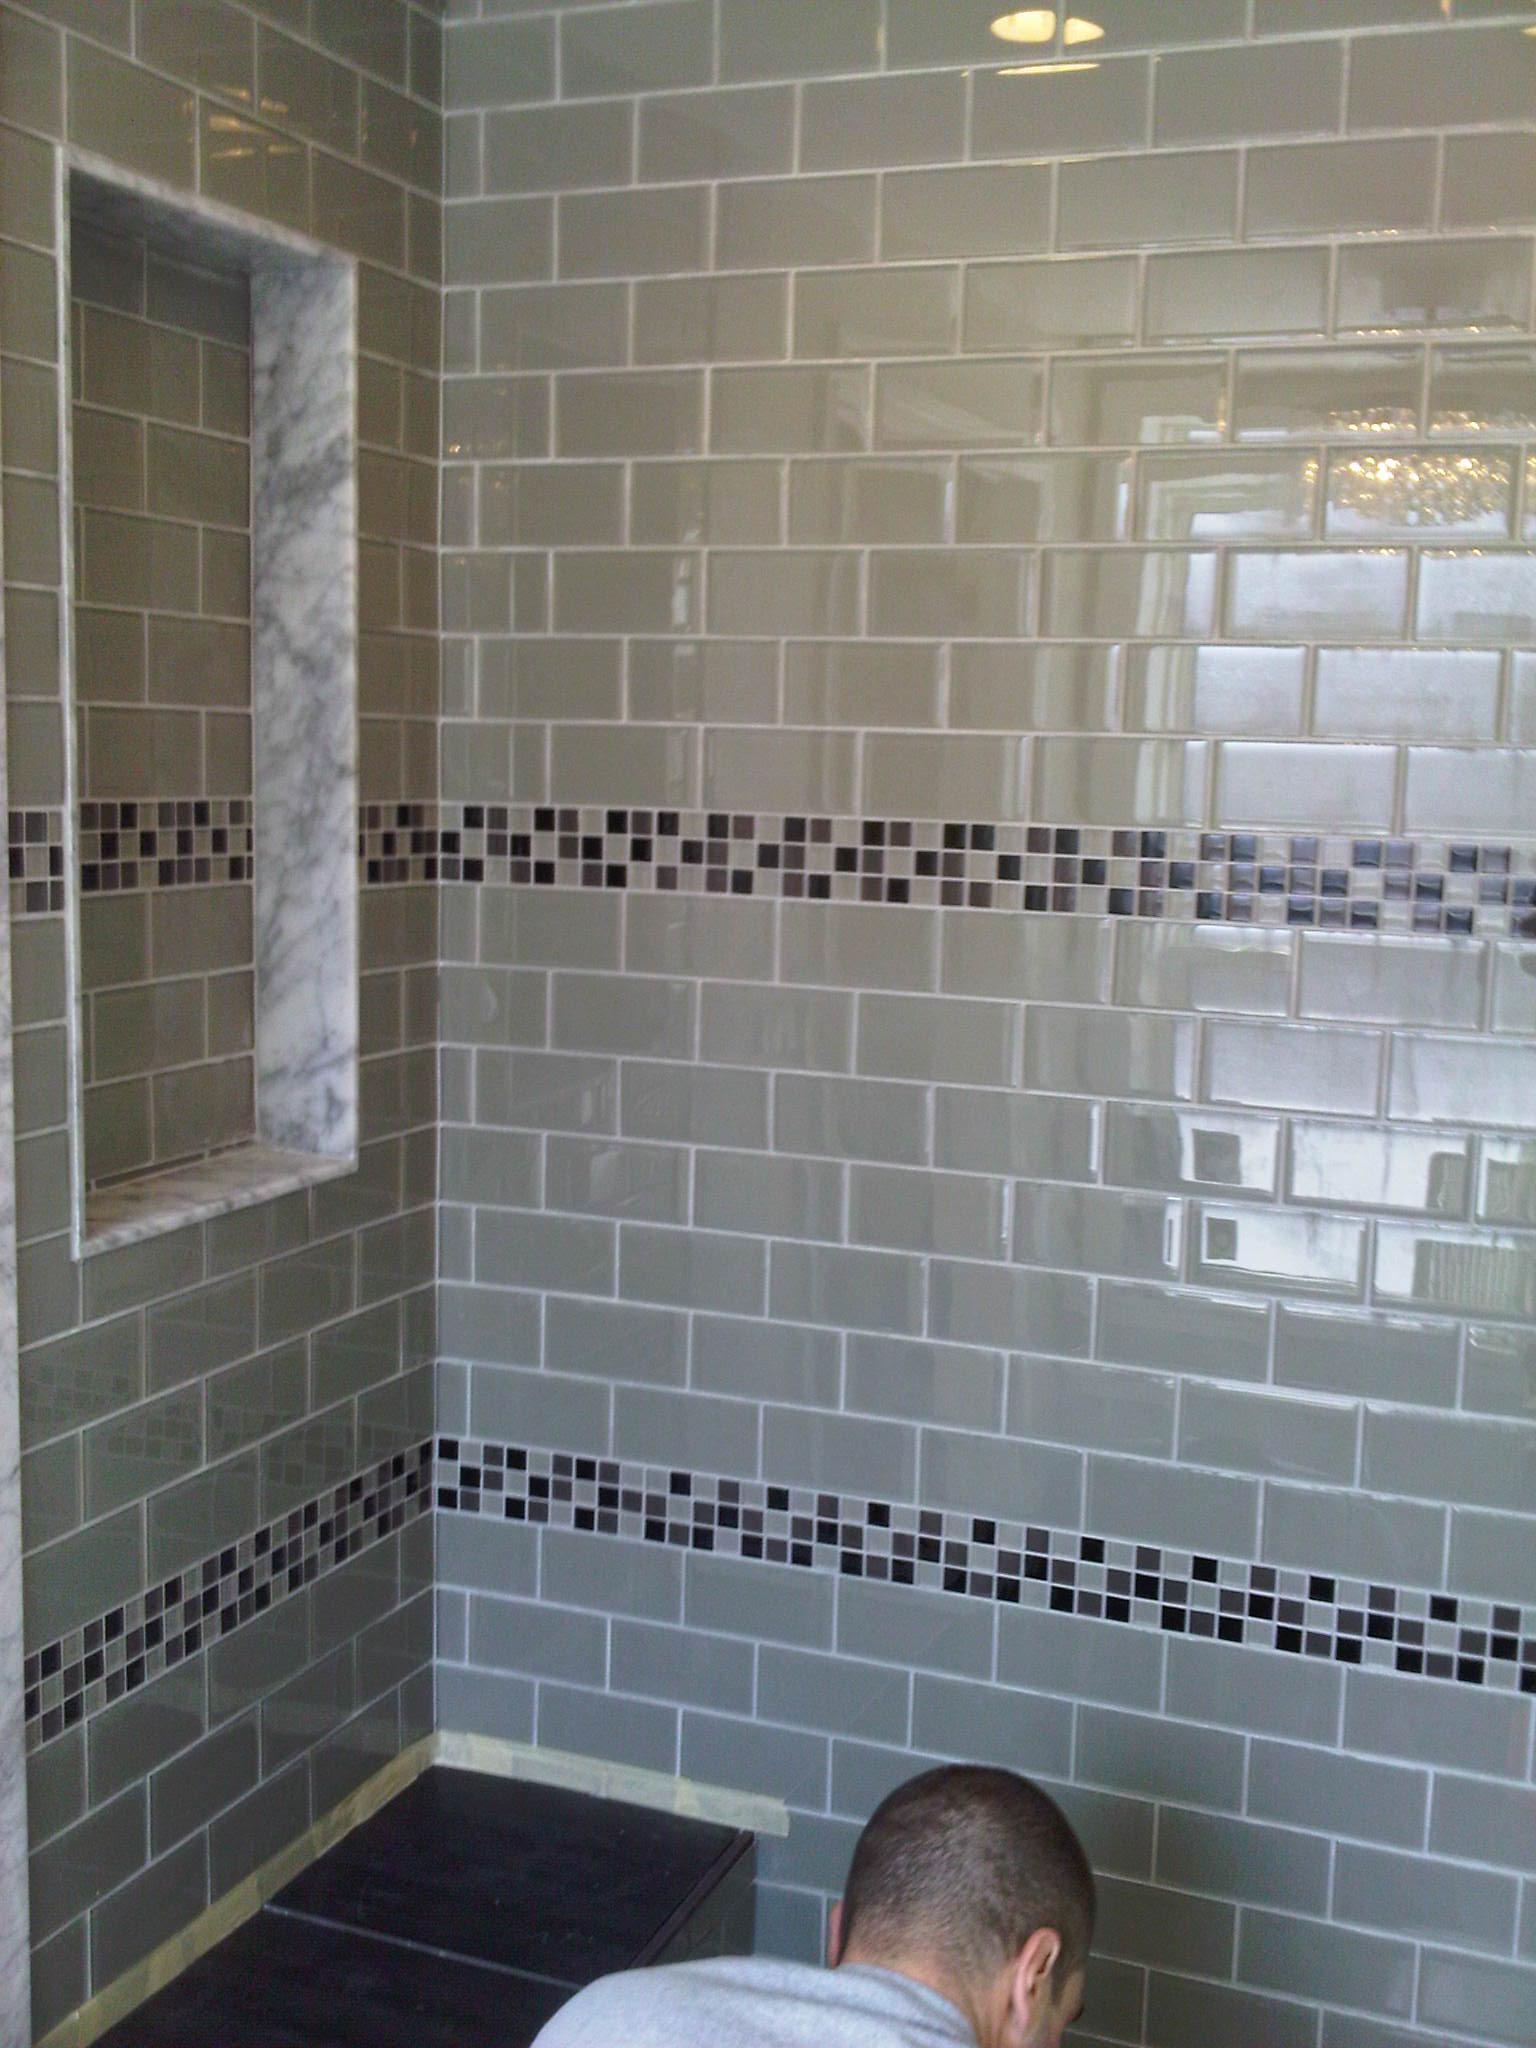 30 great ideas of glass tile for bath Glass Tiles Bathroom.